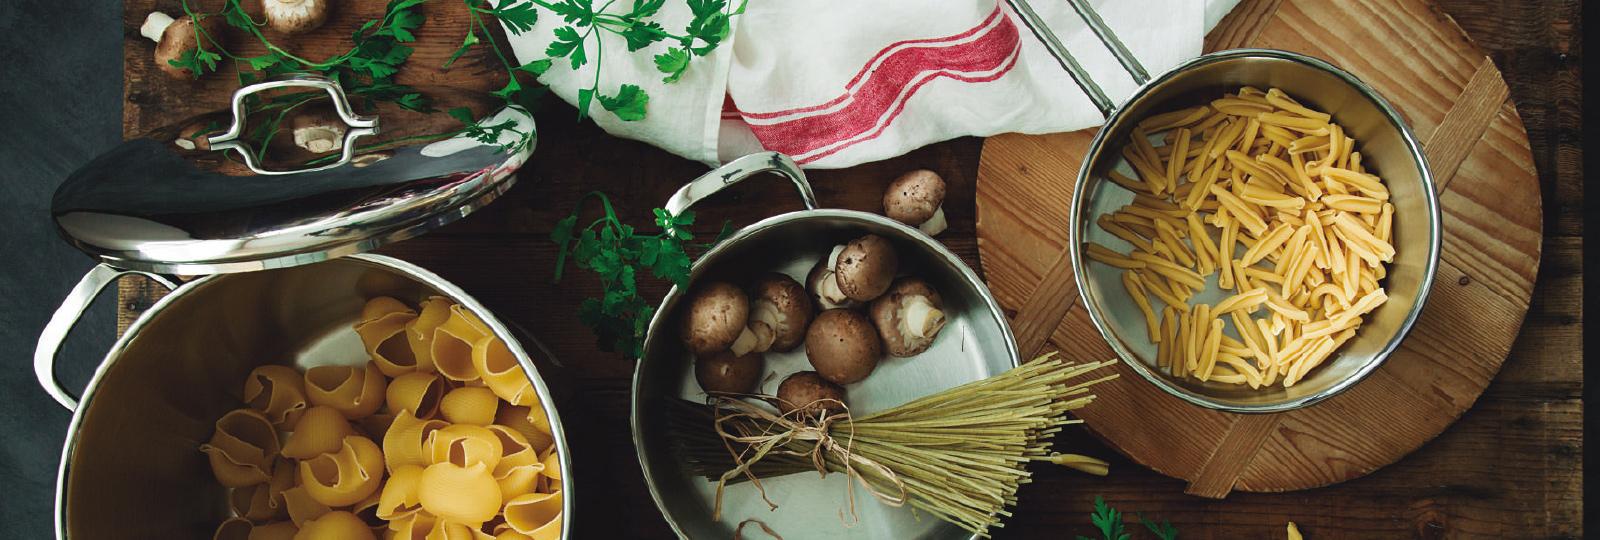 Menaje para hosteler a vajillas para hosteler a for Menaje hosteleria